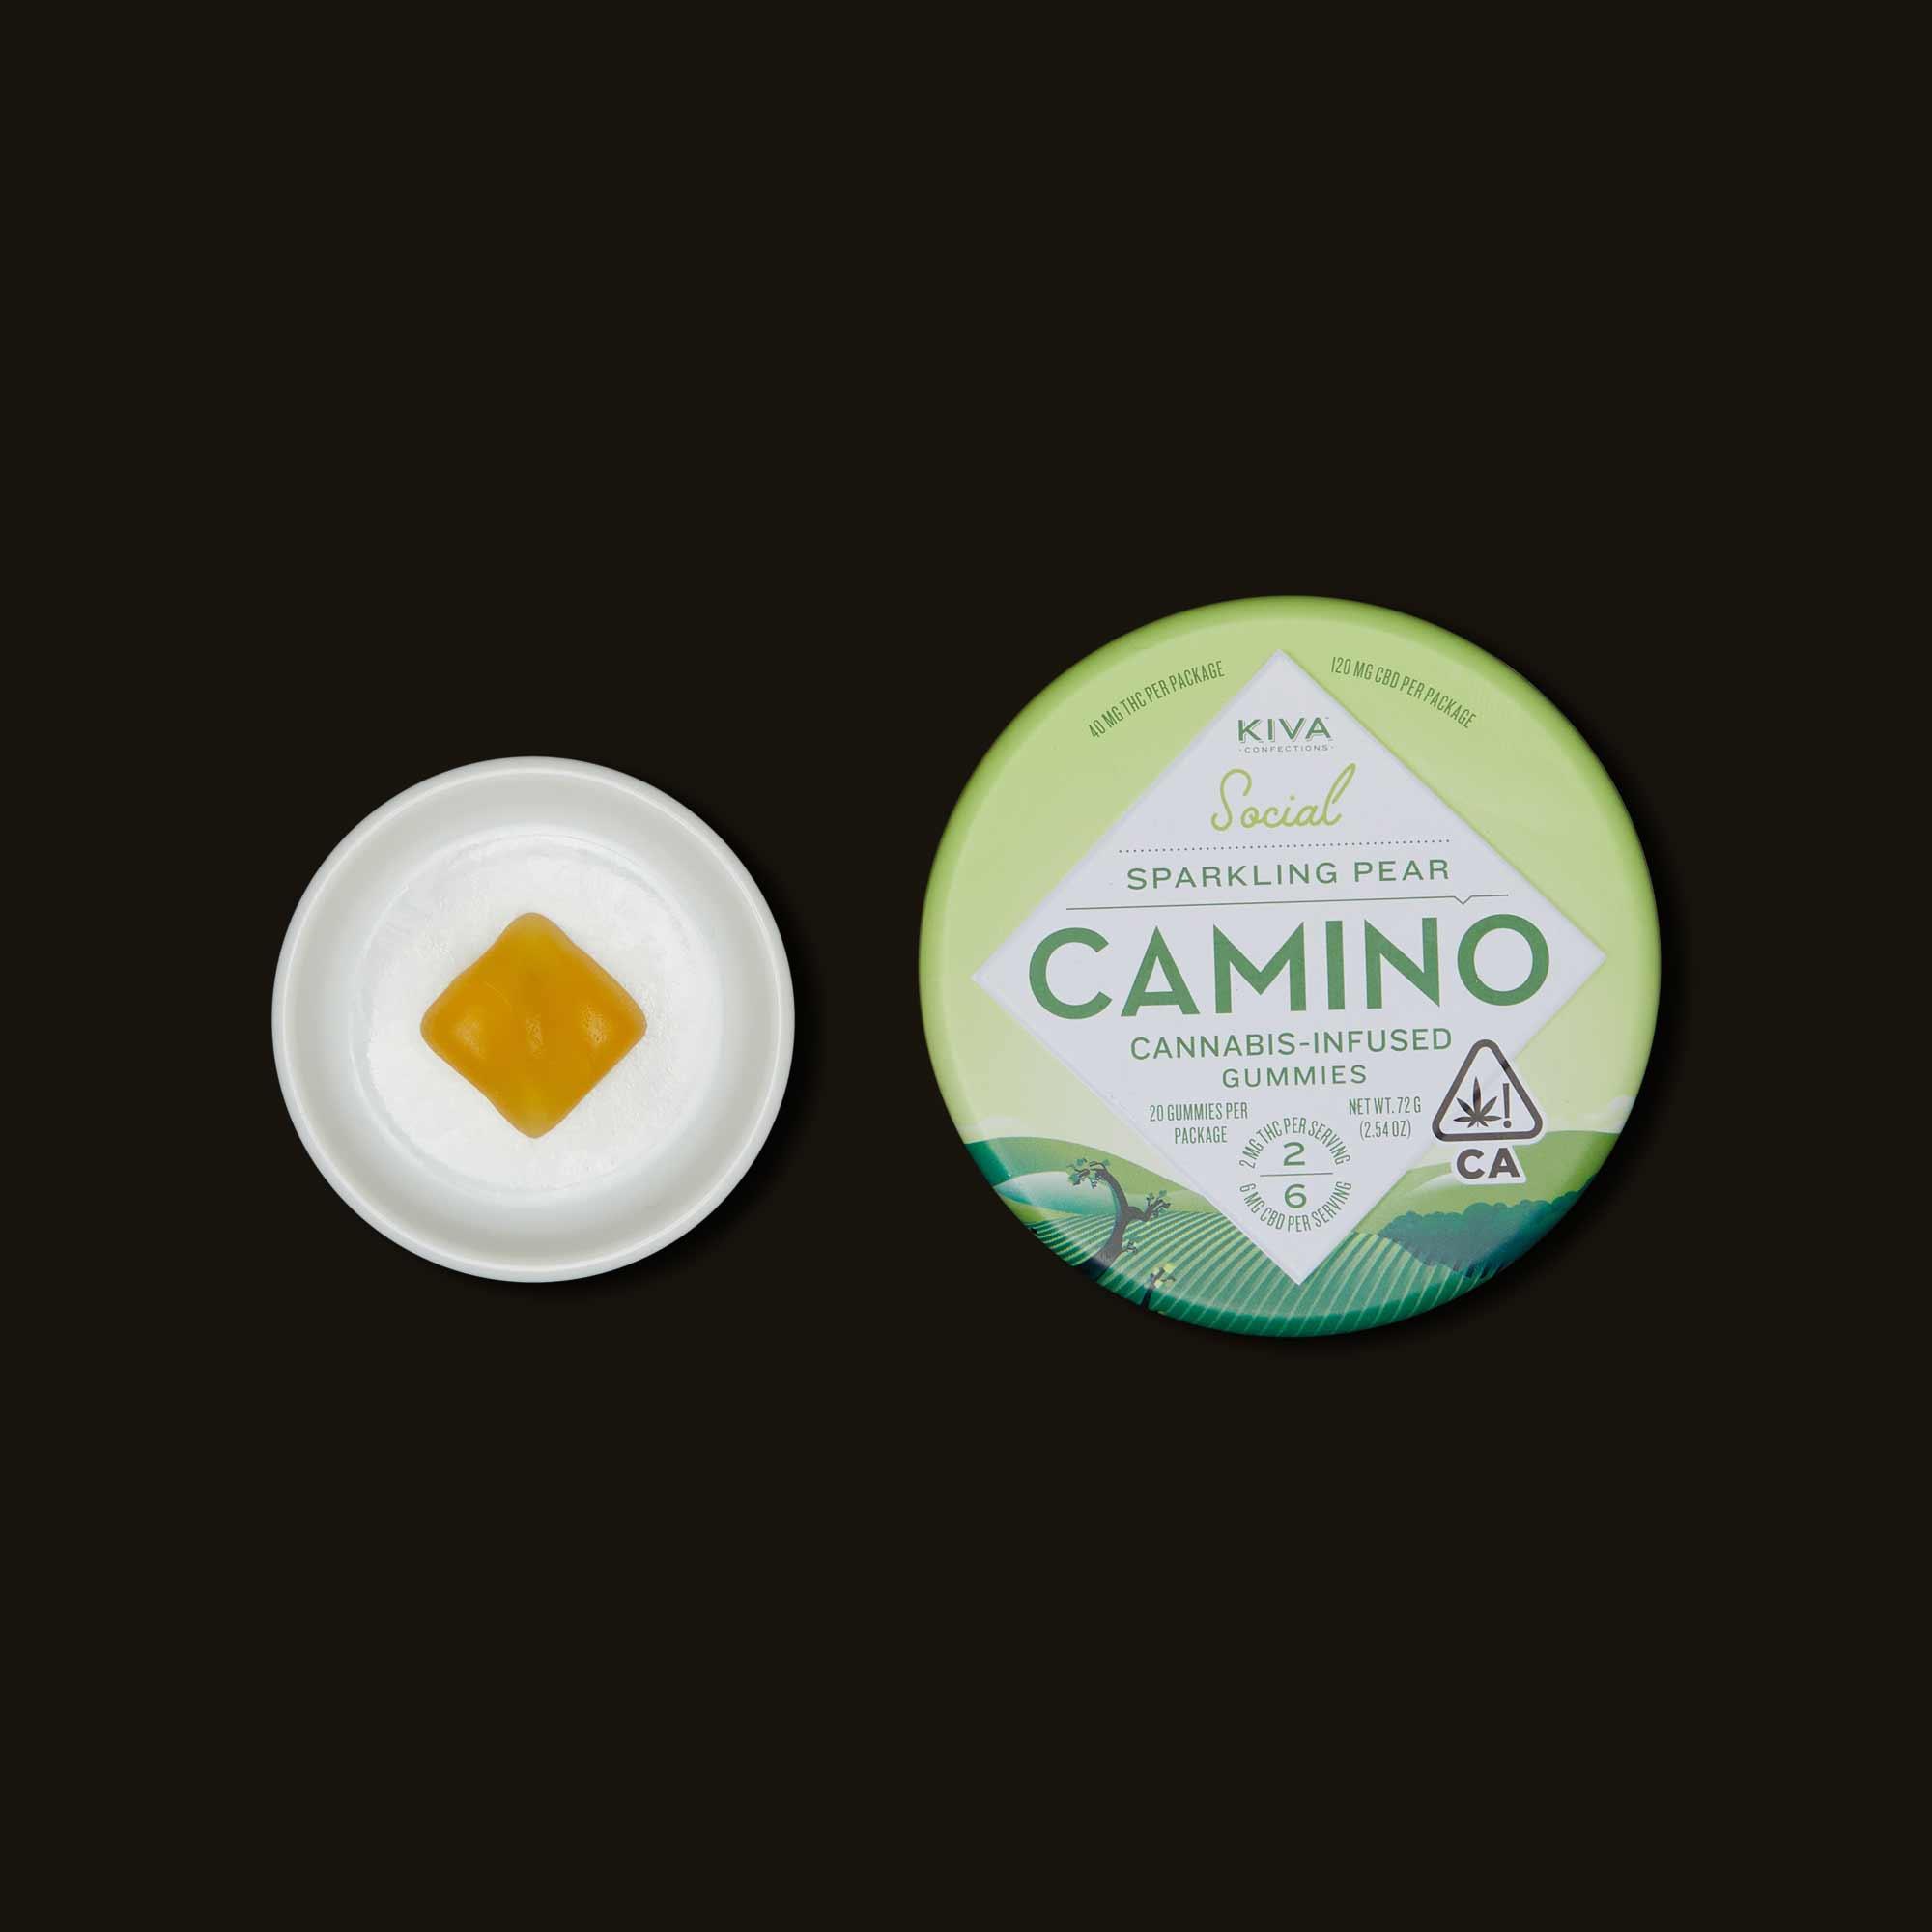 Kiva Confections Camino Sparkling Pear Gummies